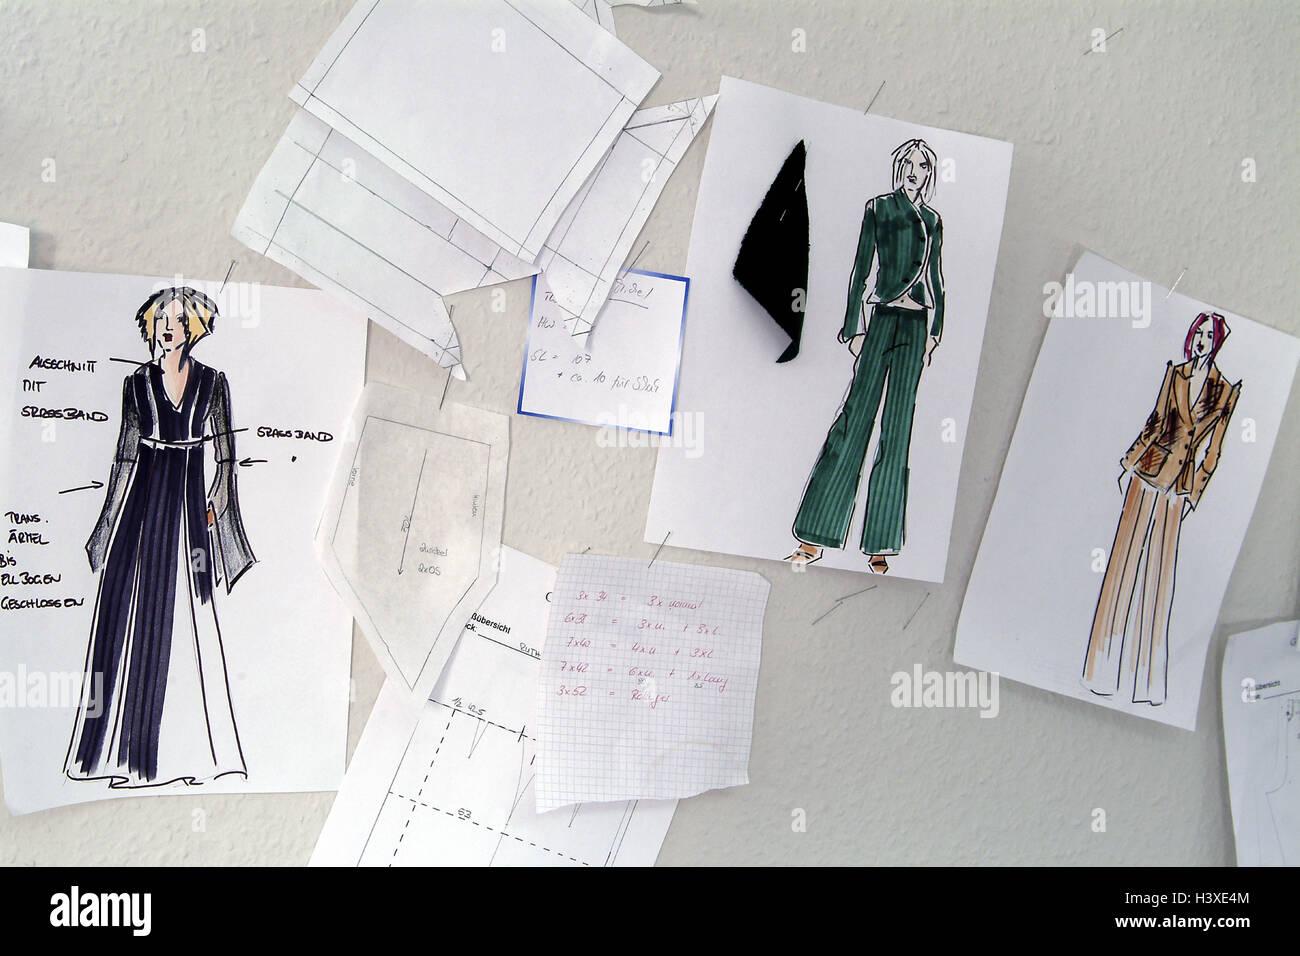 Diseo de moda dibujos diseos silenciosamente la vida la moda